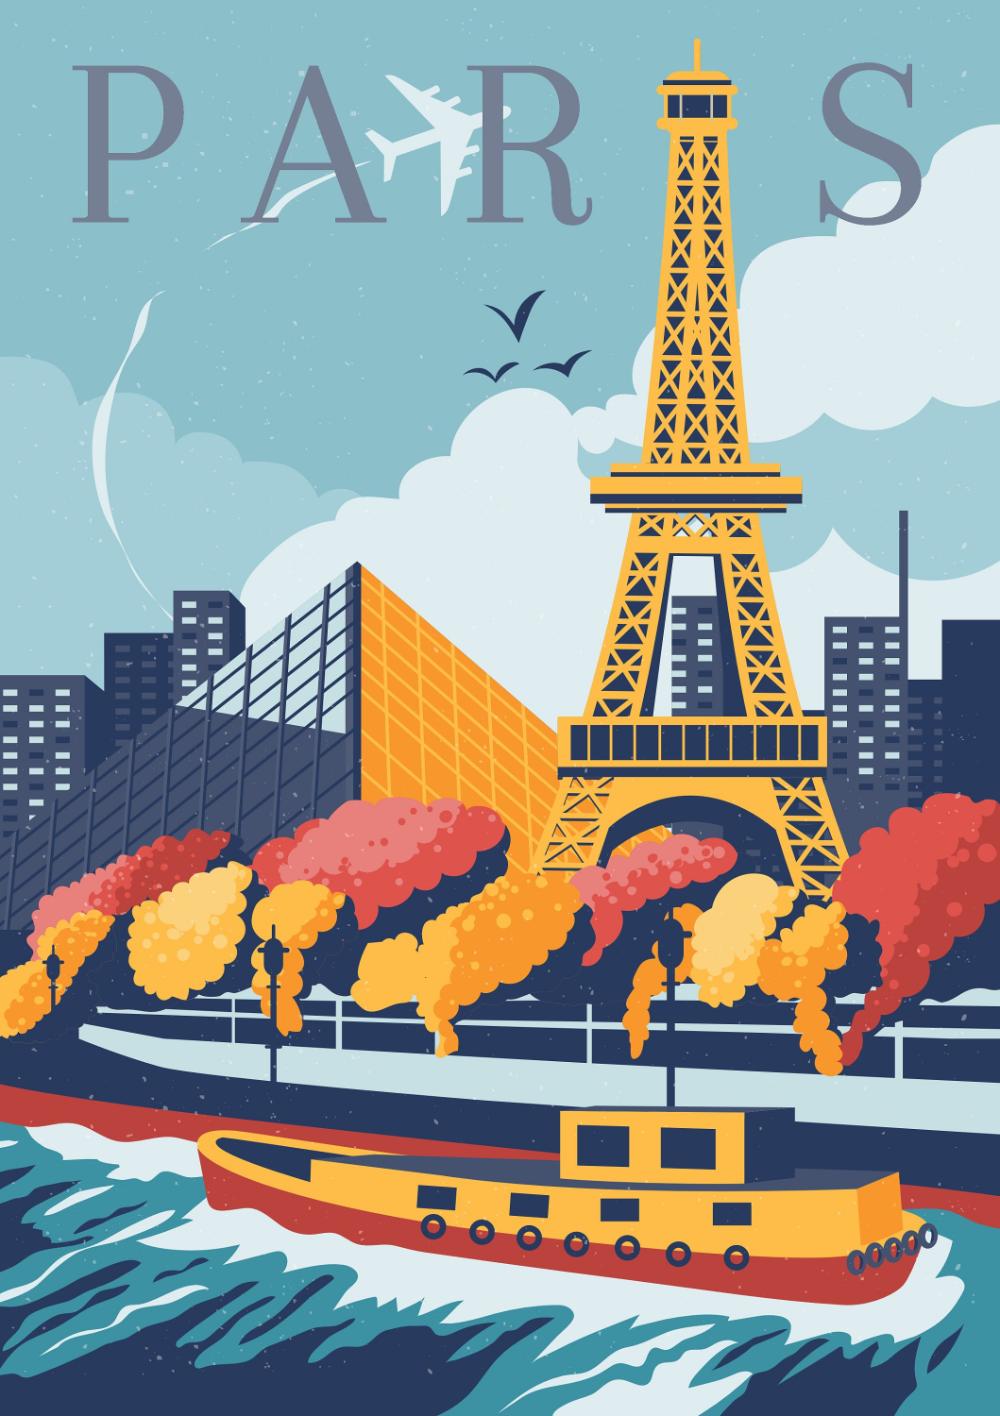 Paris Travel Poster Eiffel Tower Travel Poster France Travel Poster Vintage Poster Paris P Paris Travel Poster Vintage Wall Art Prints Paris Poster Vintage